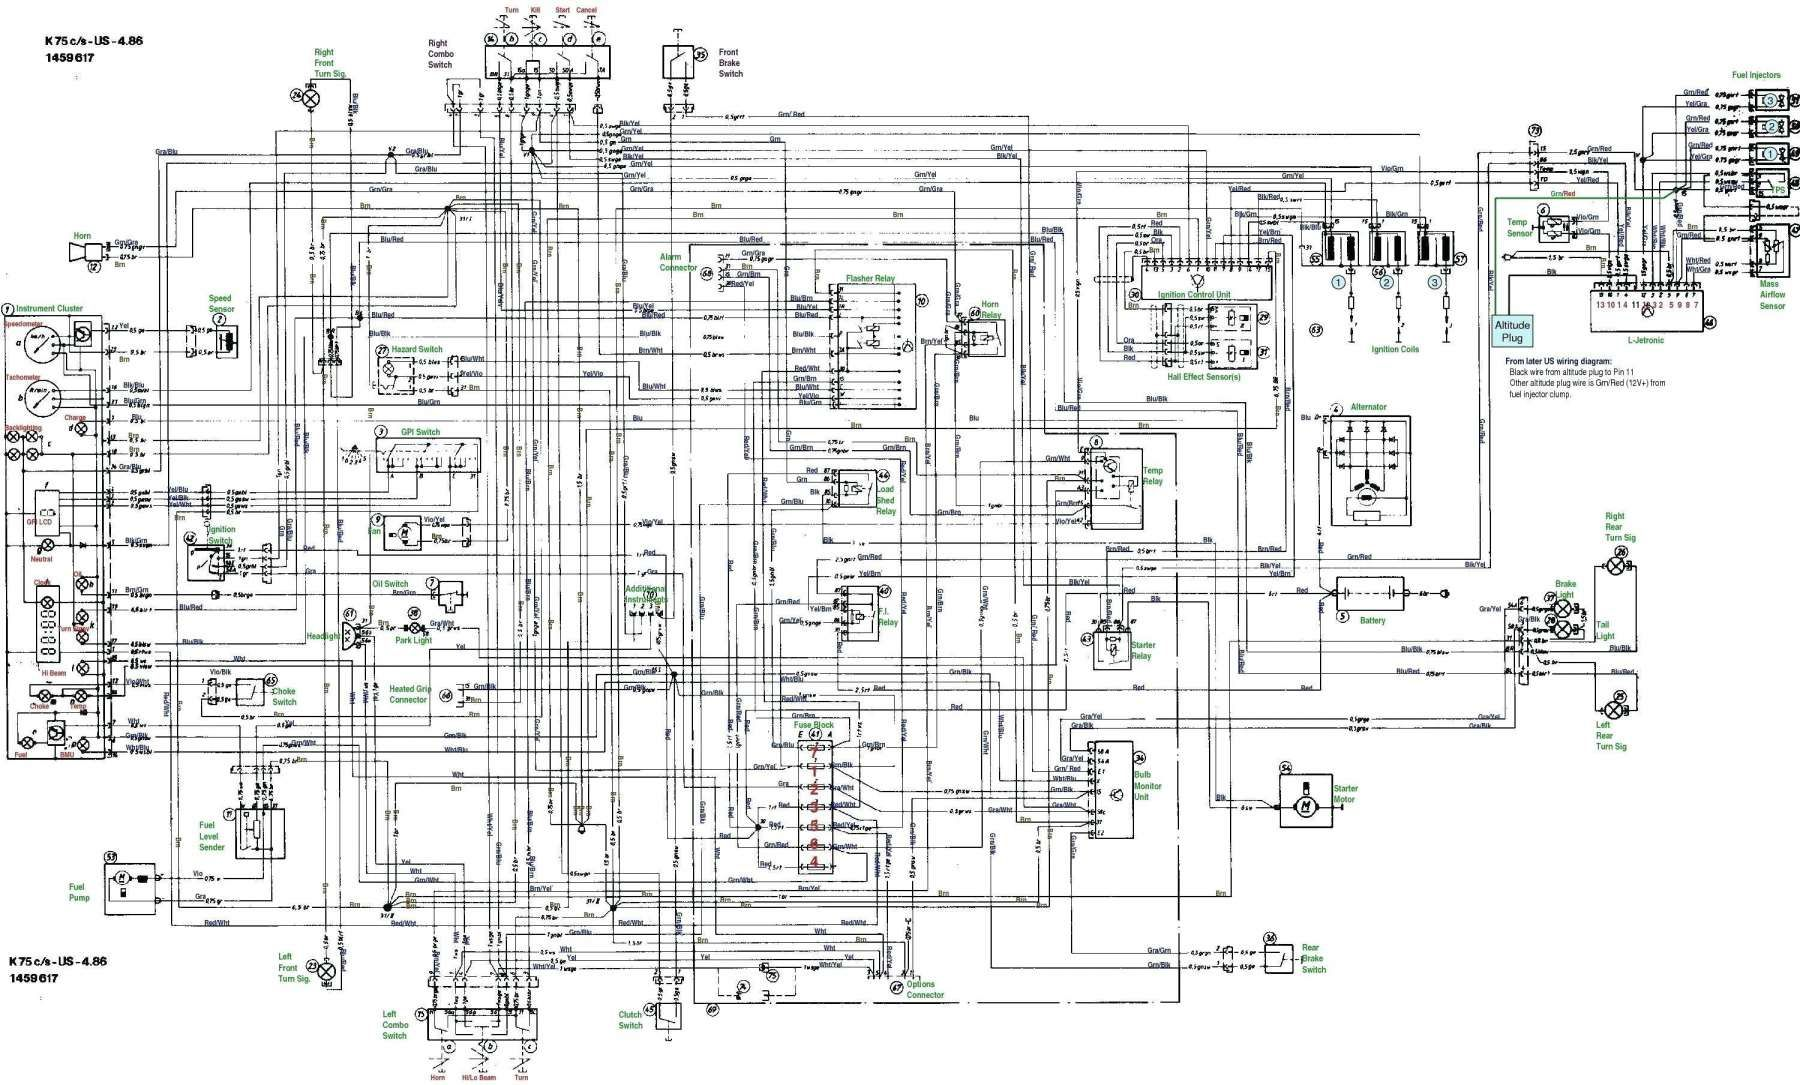 17+ bmw e36 m3 engine wiring diagram - engine diagram - wiringg.net  pinterest